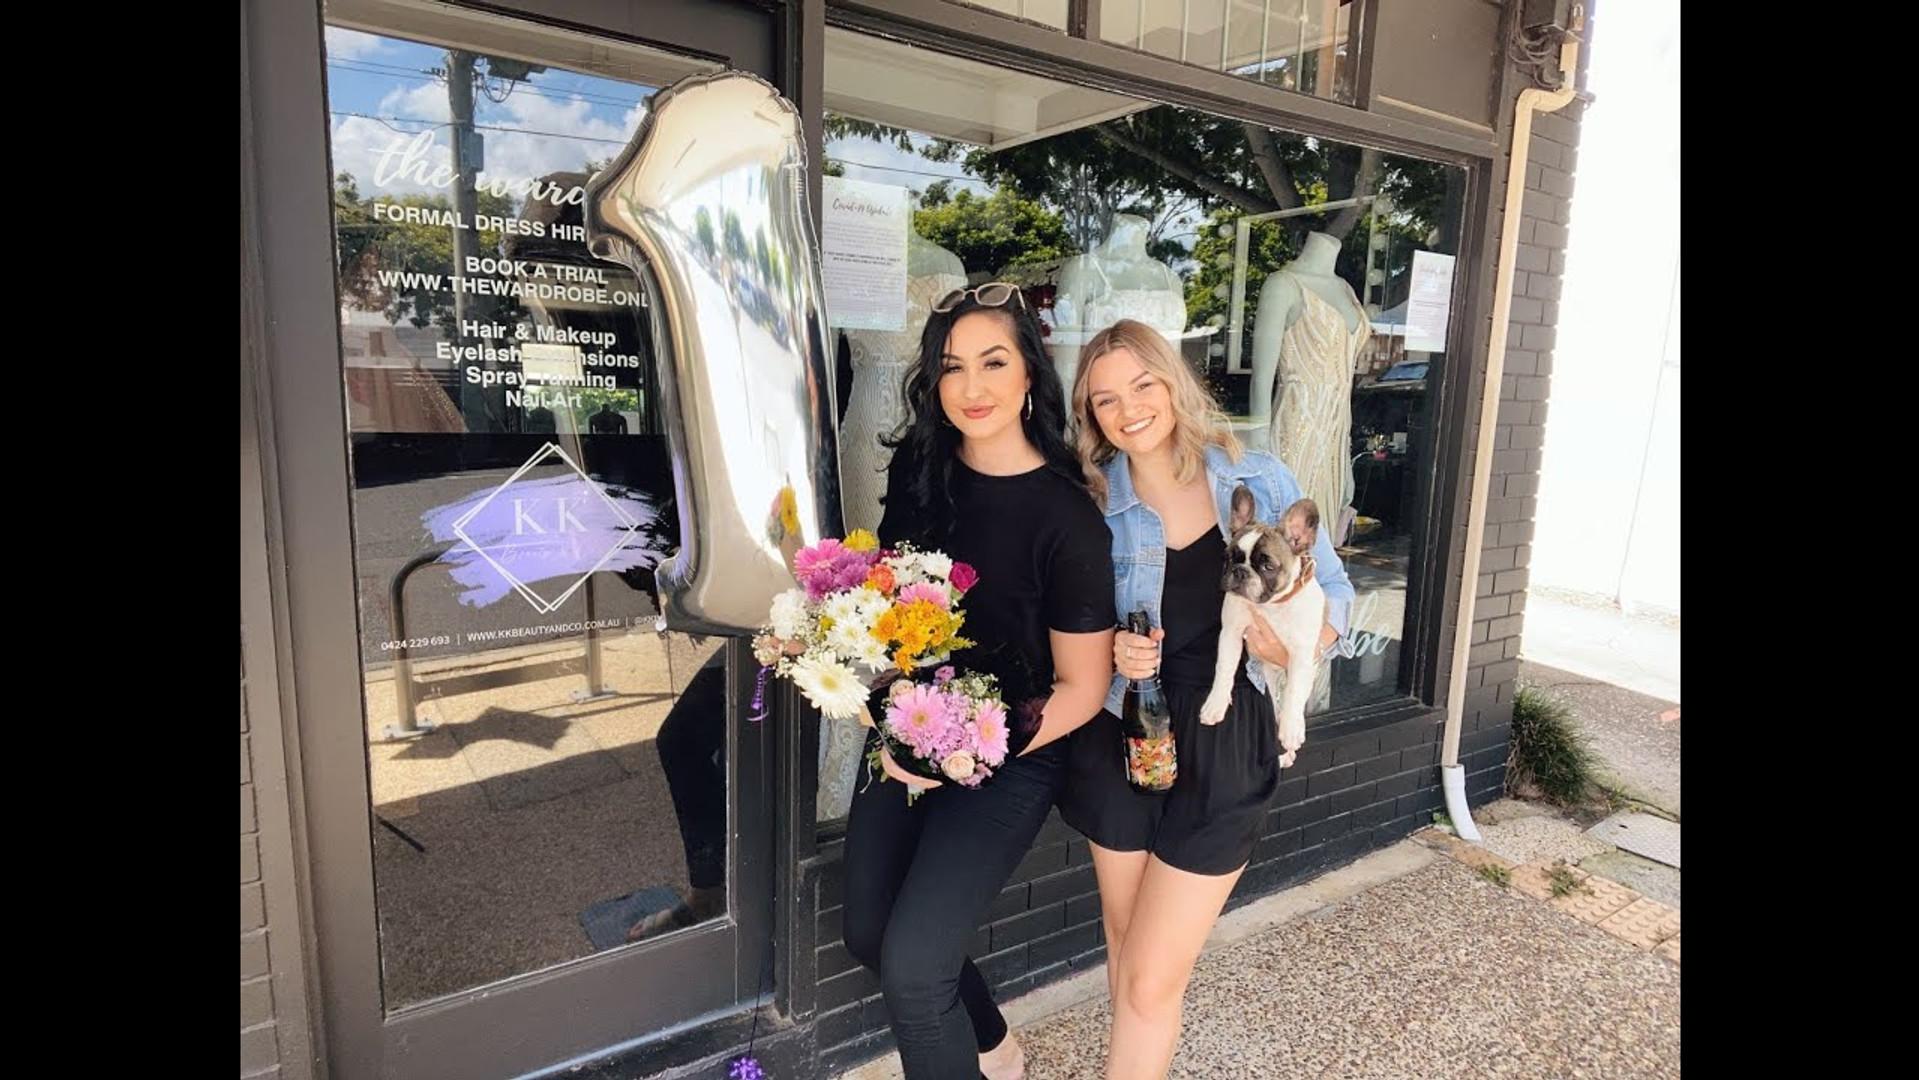 KK Beauty & Co turns 1!